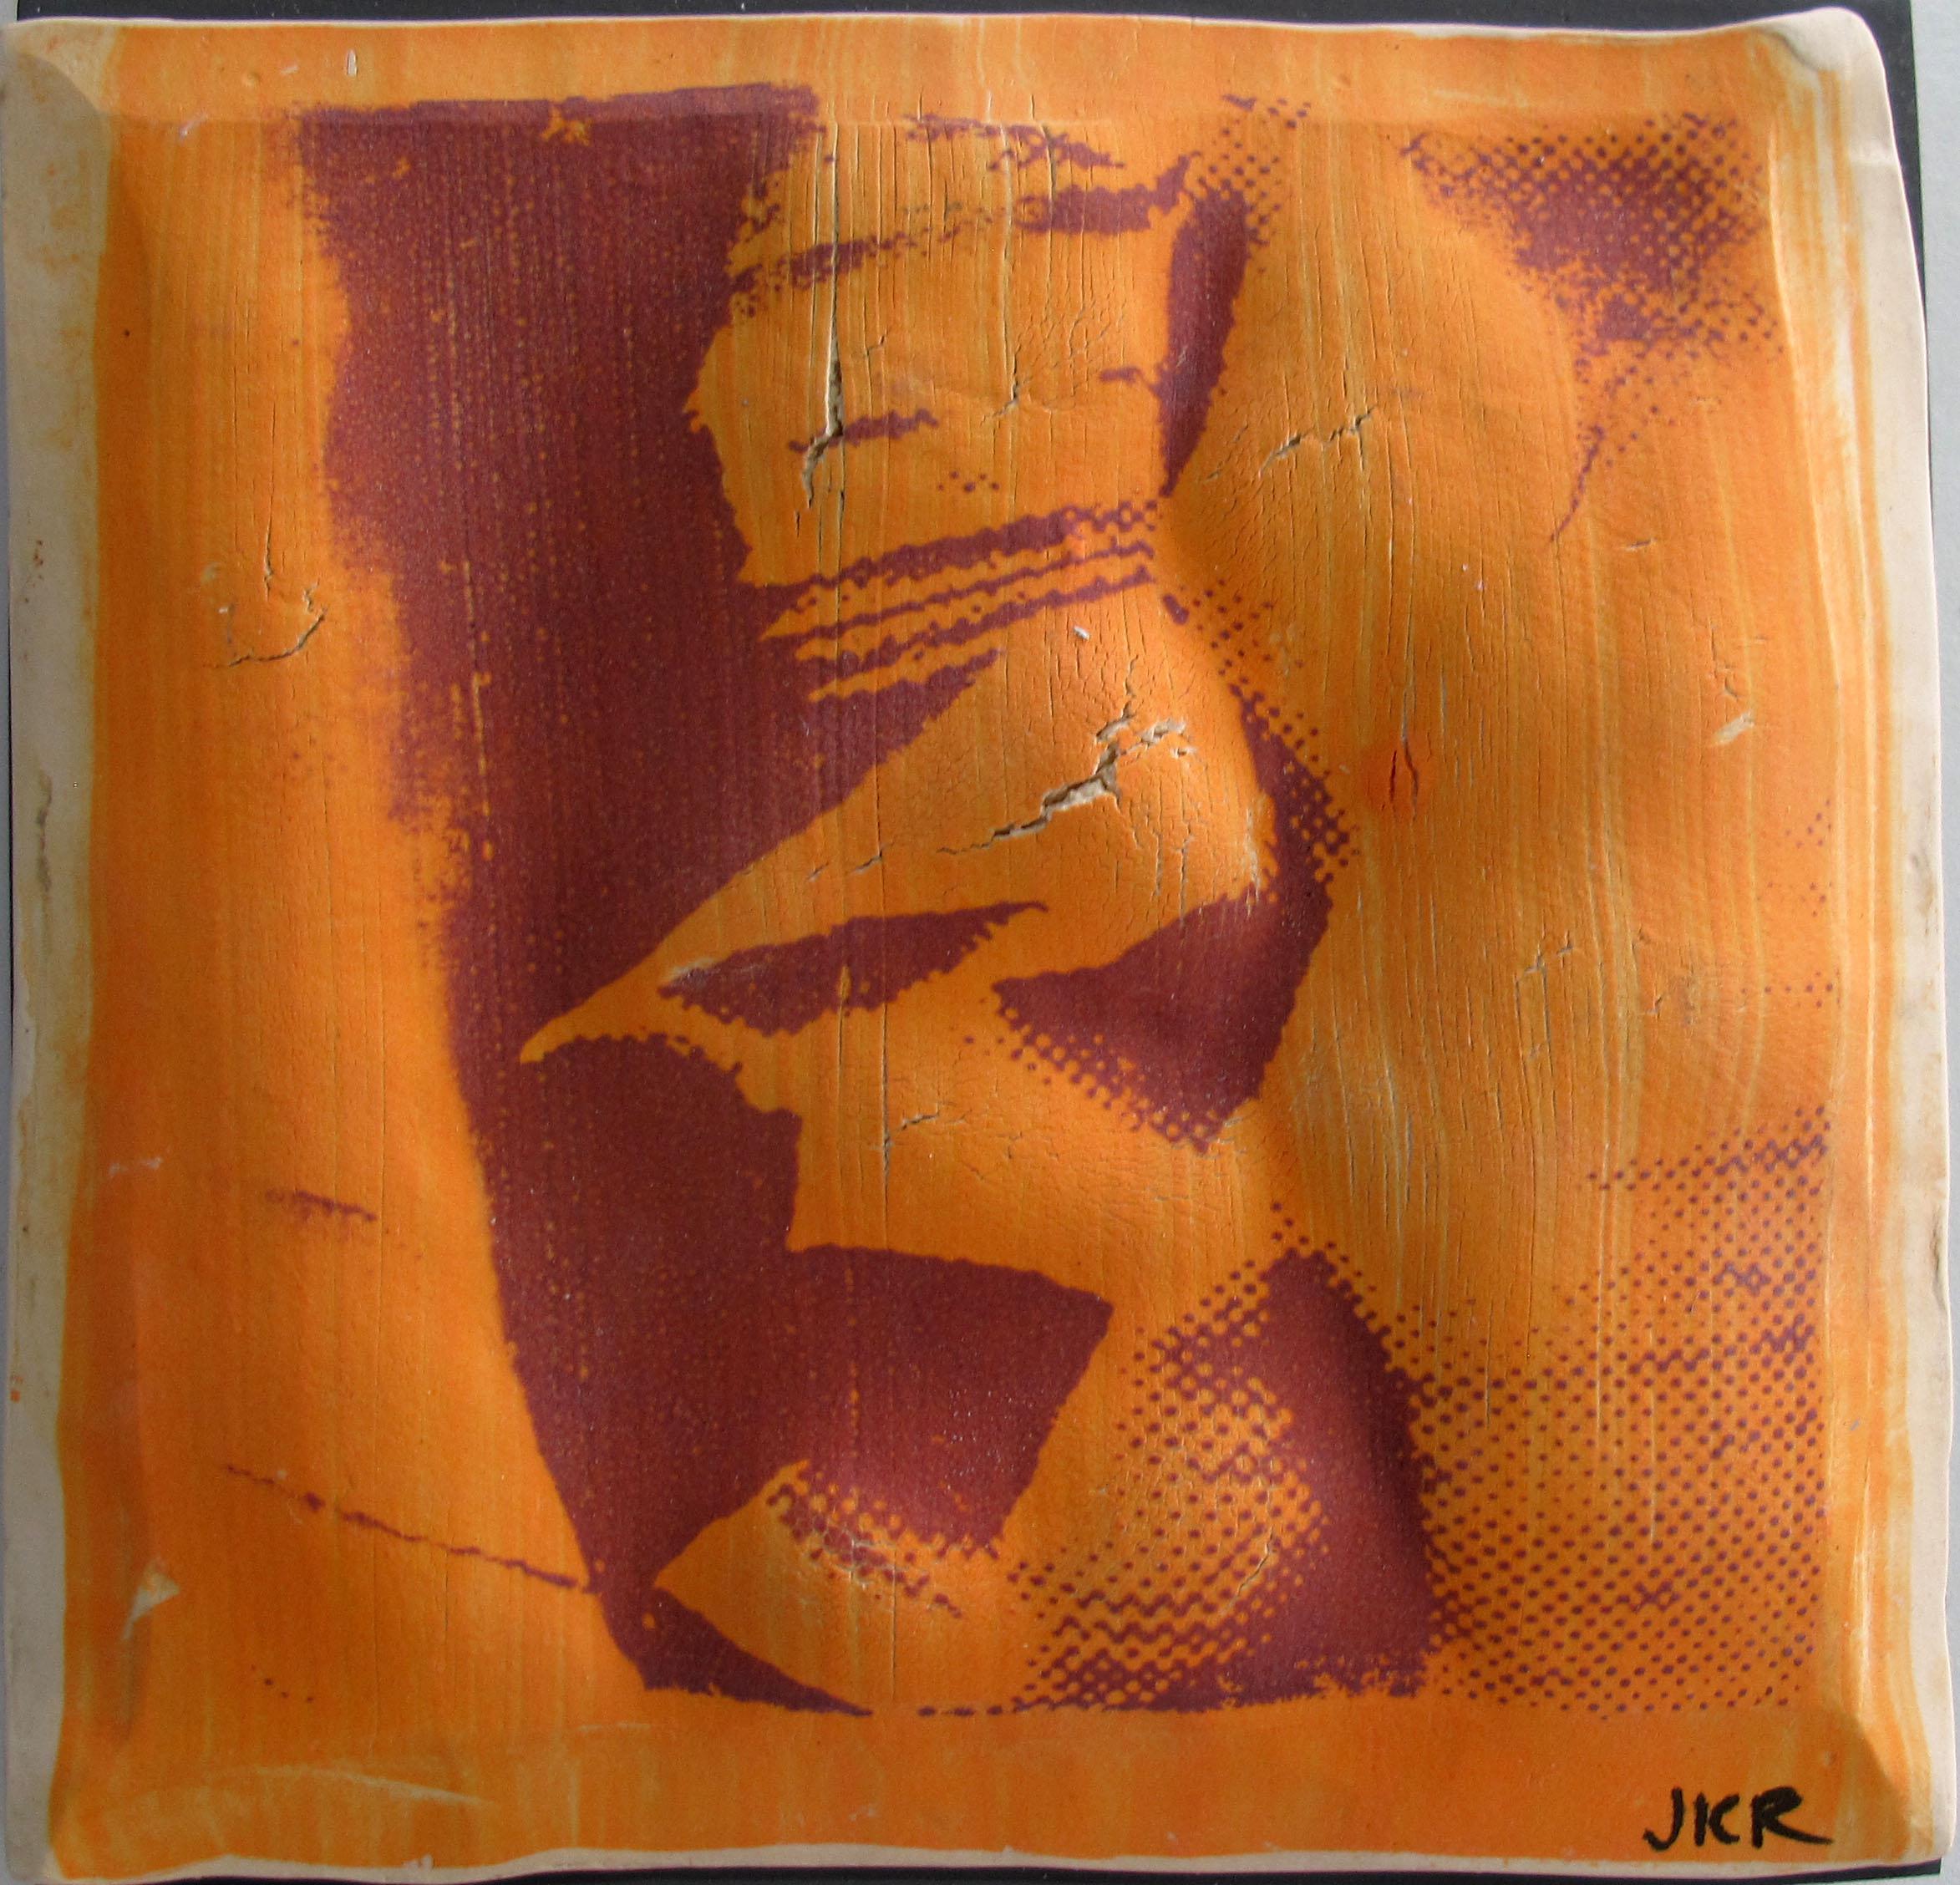 Antelope yelo orange violet 1.jpg